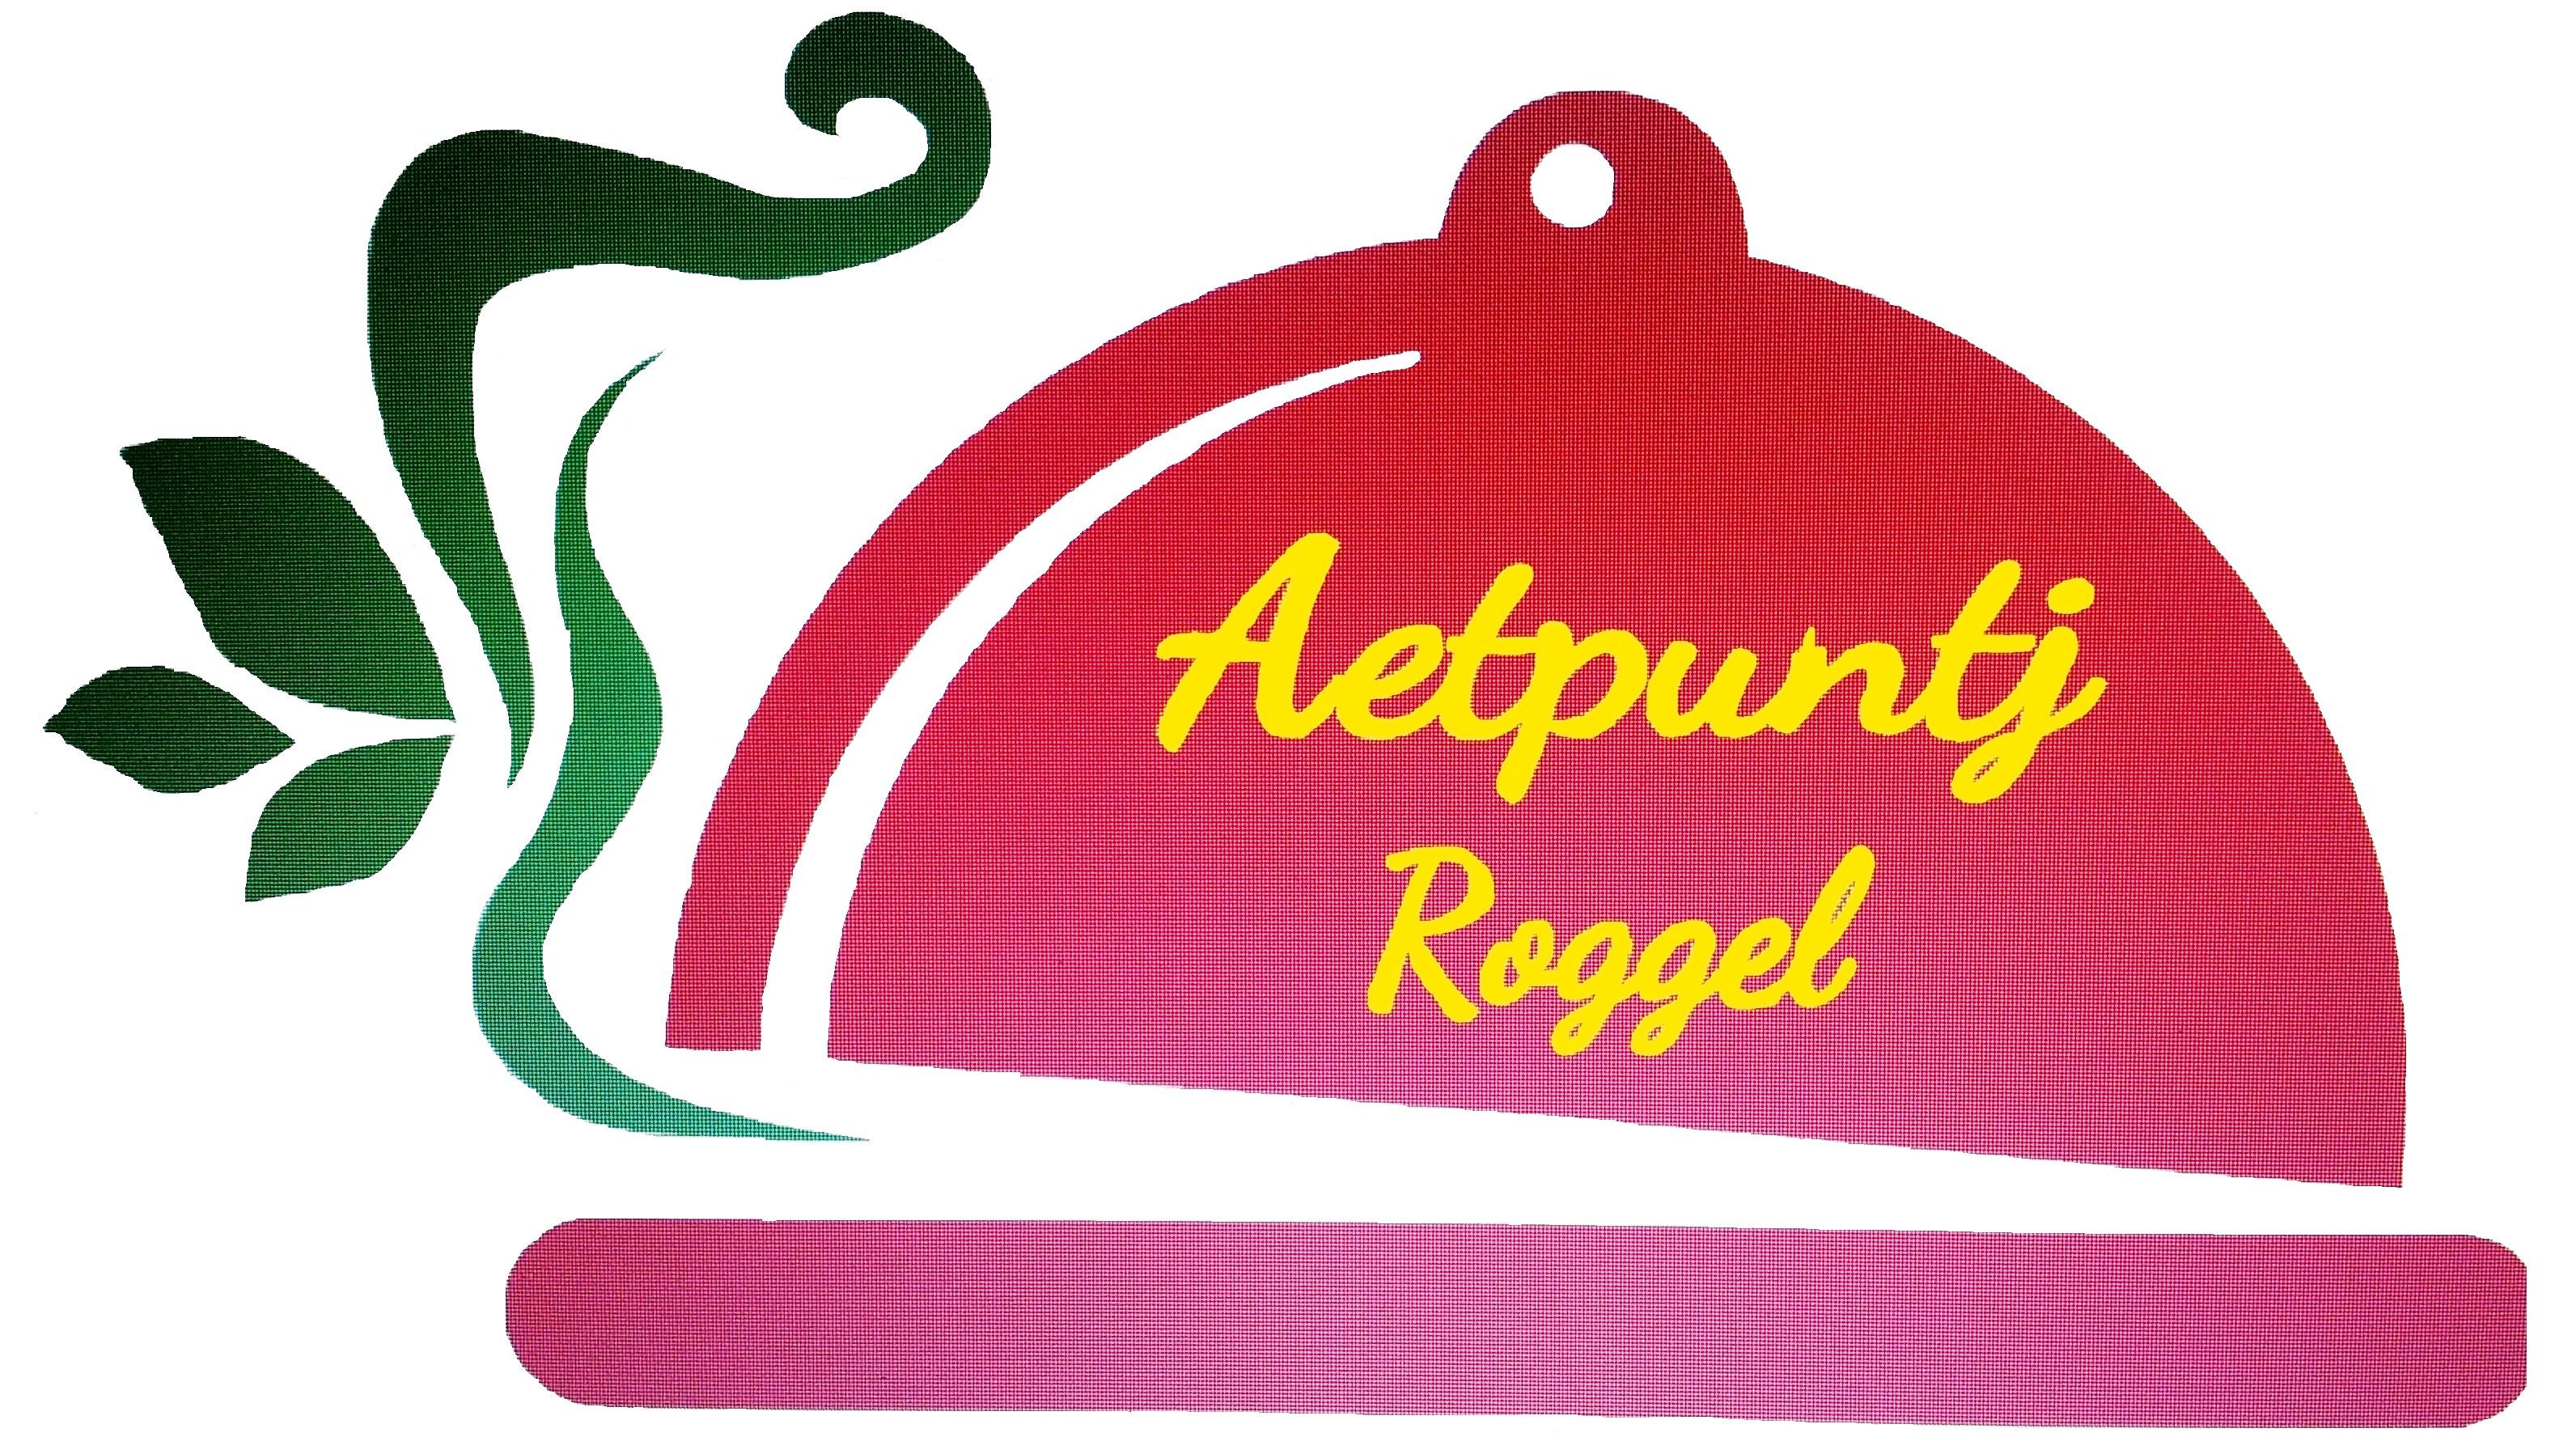 Aetpuntj Roggel